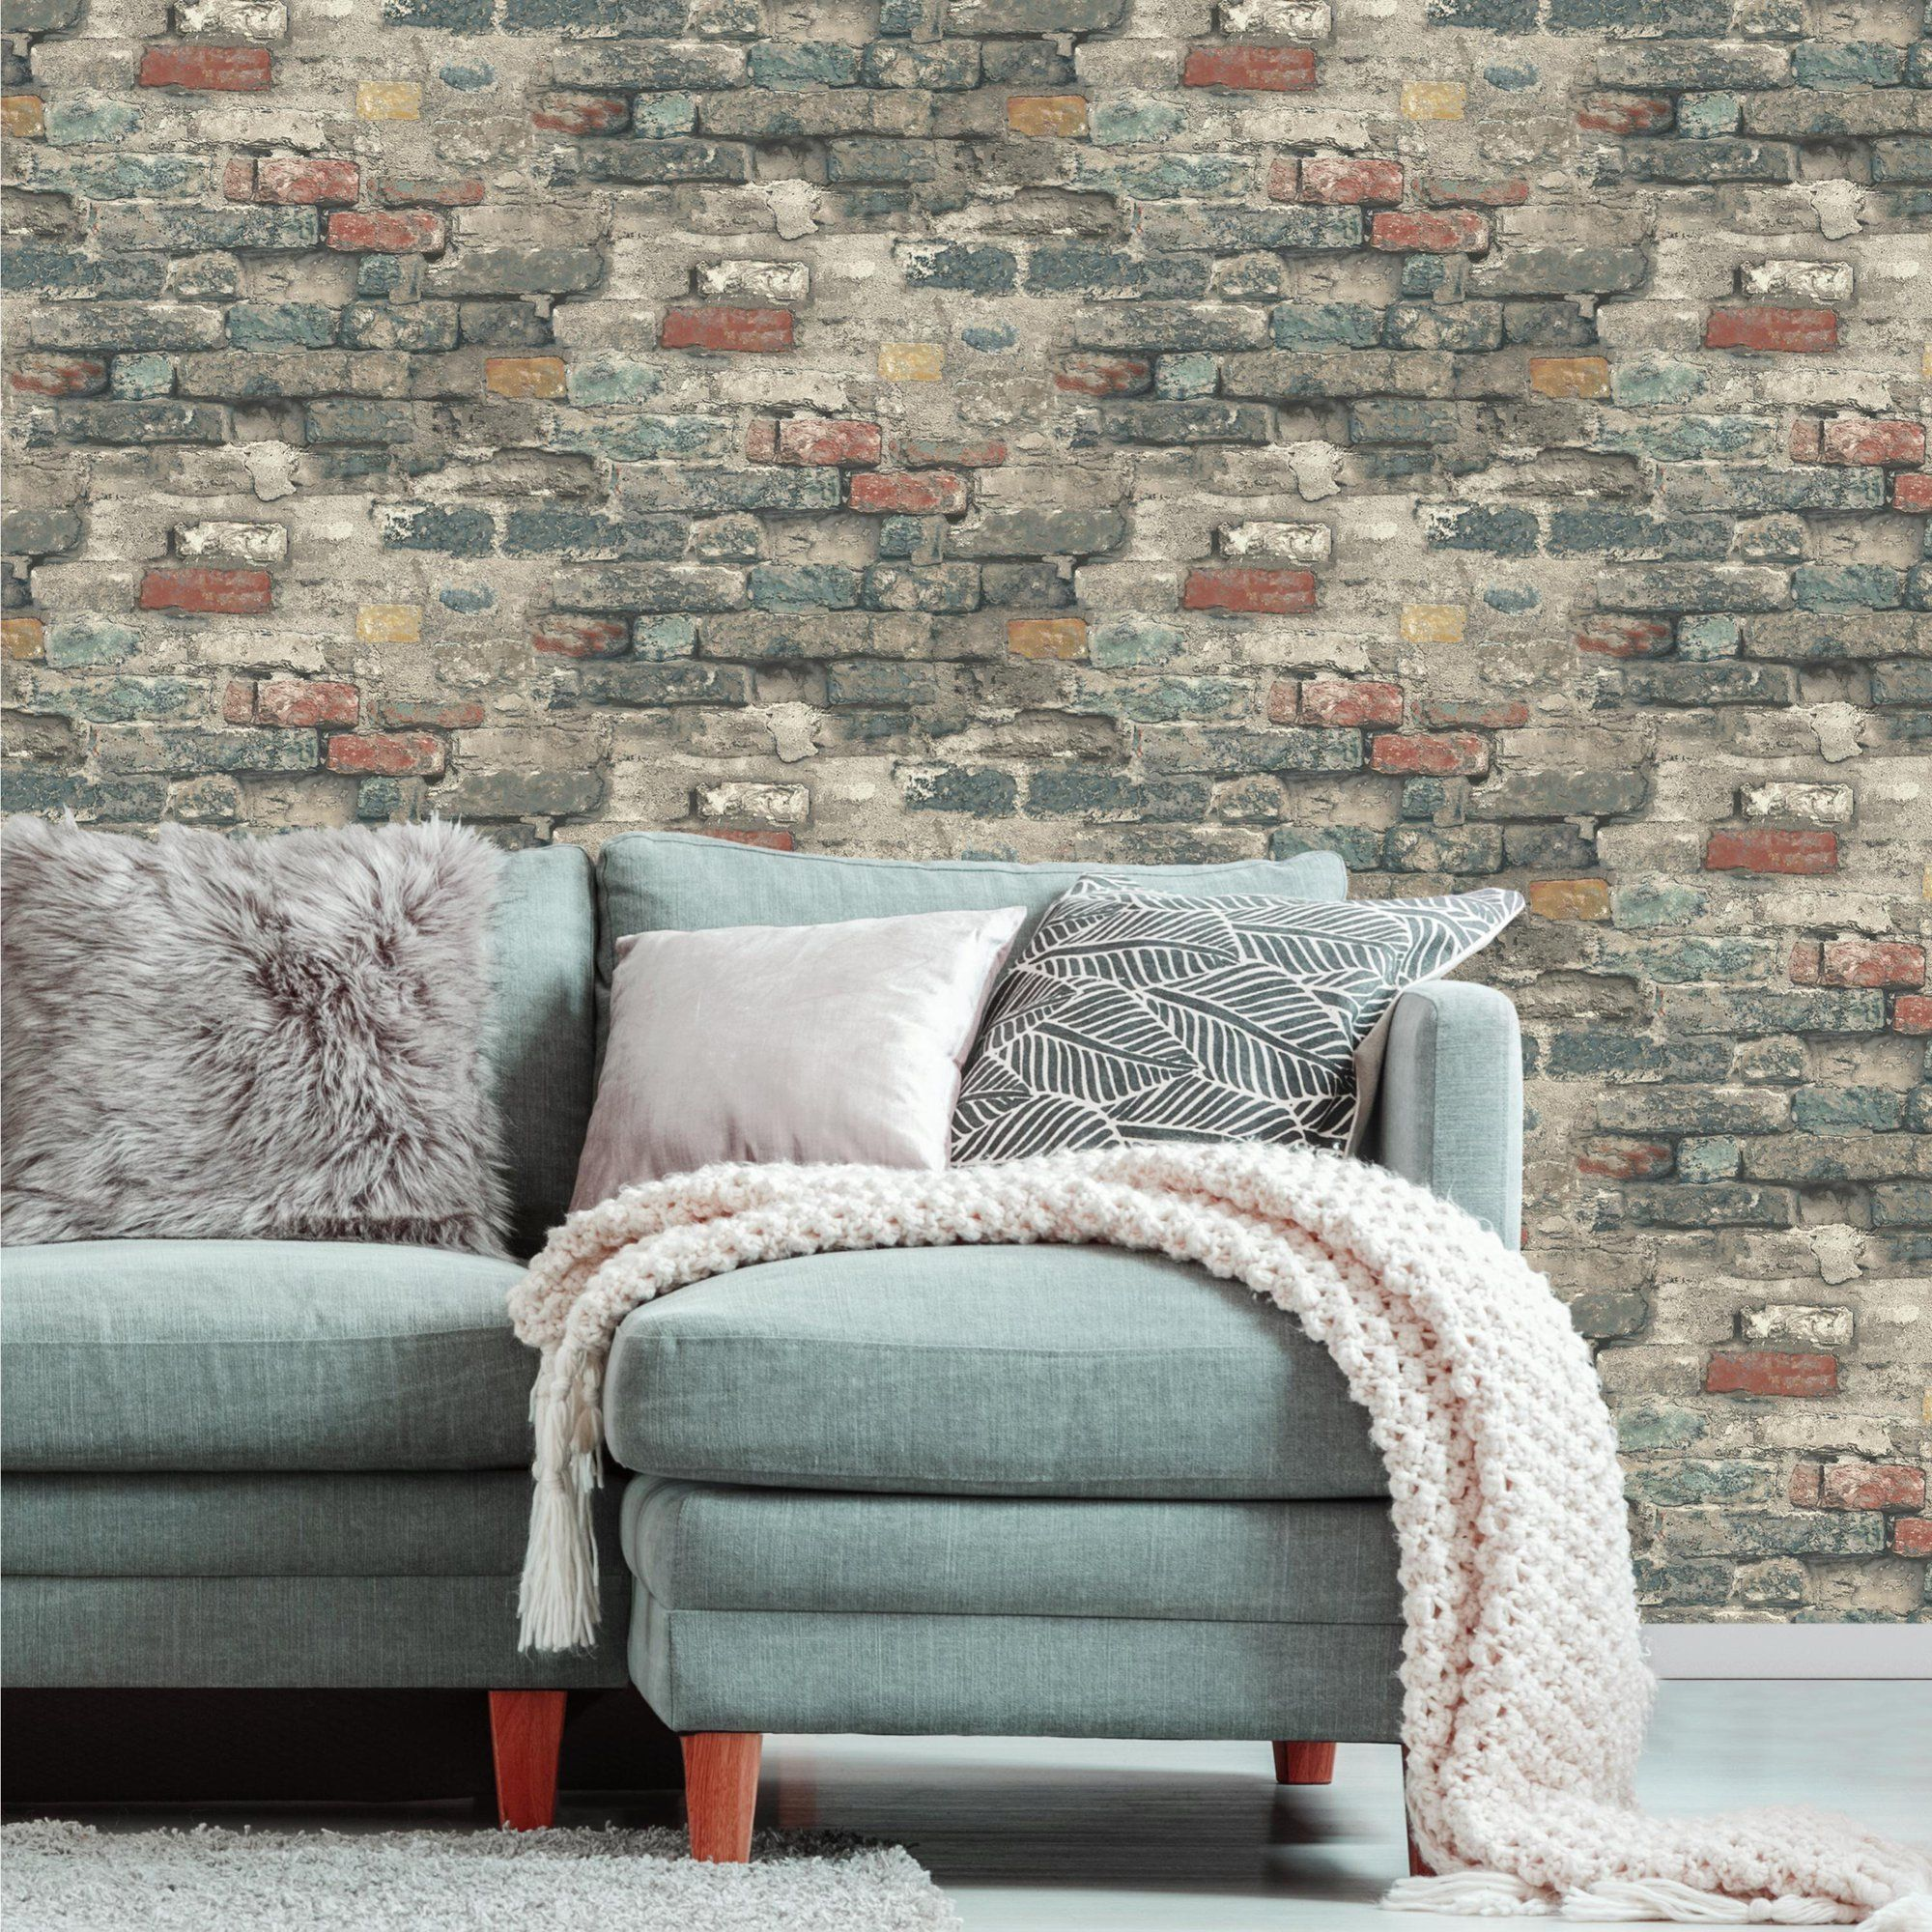 Roommates Brick Alley Peel Stick Wallpaper Walmart Com Exposed Brick Wallpaper Brick Wallpaper Peel And Stick Brick Wallpaper